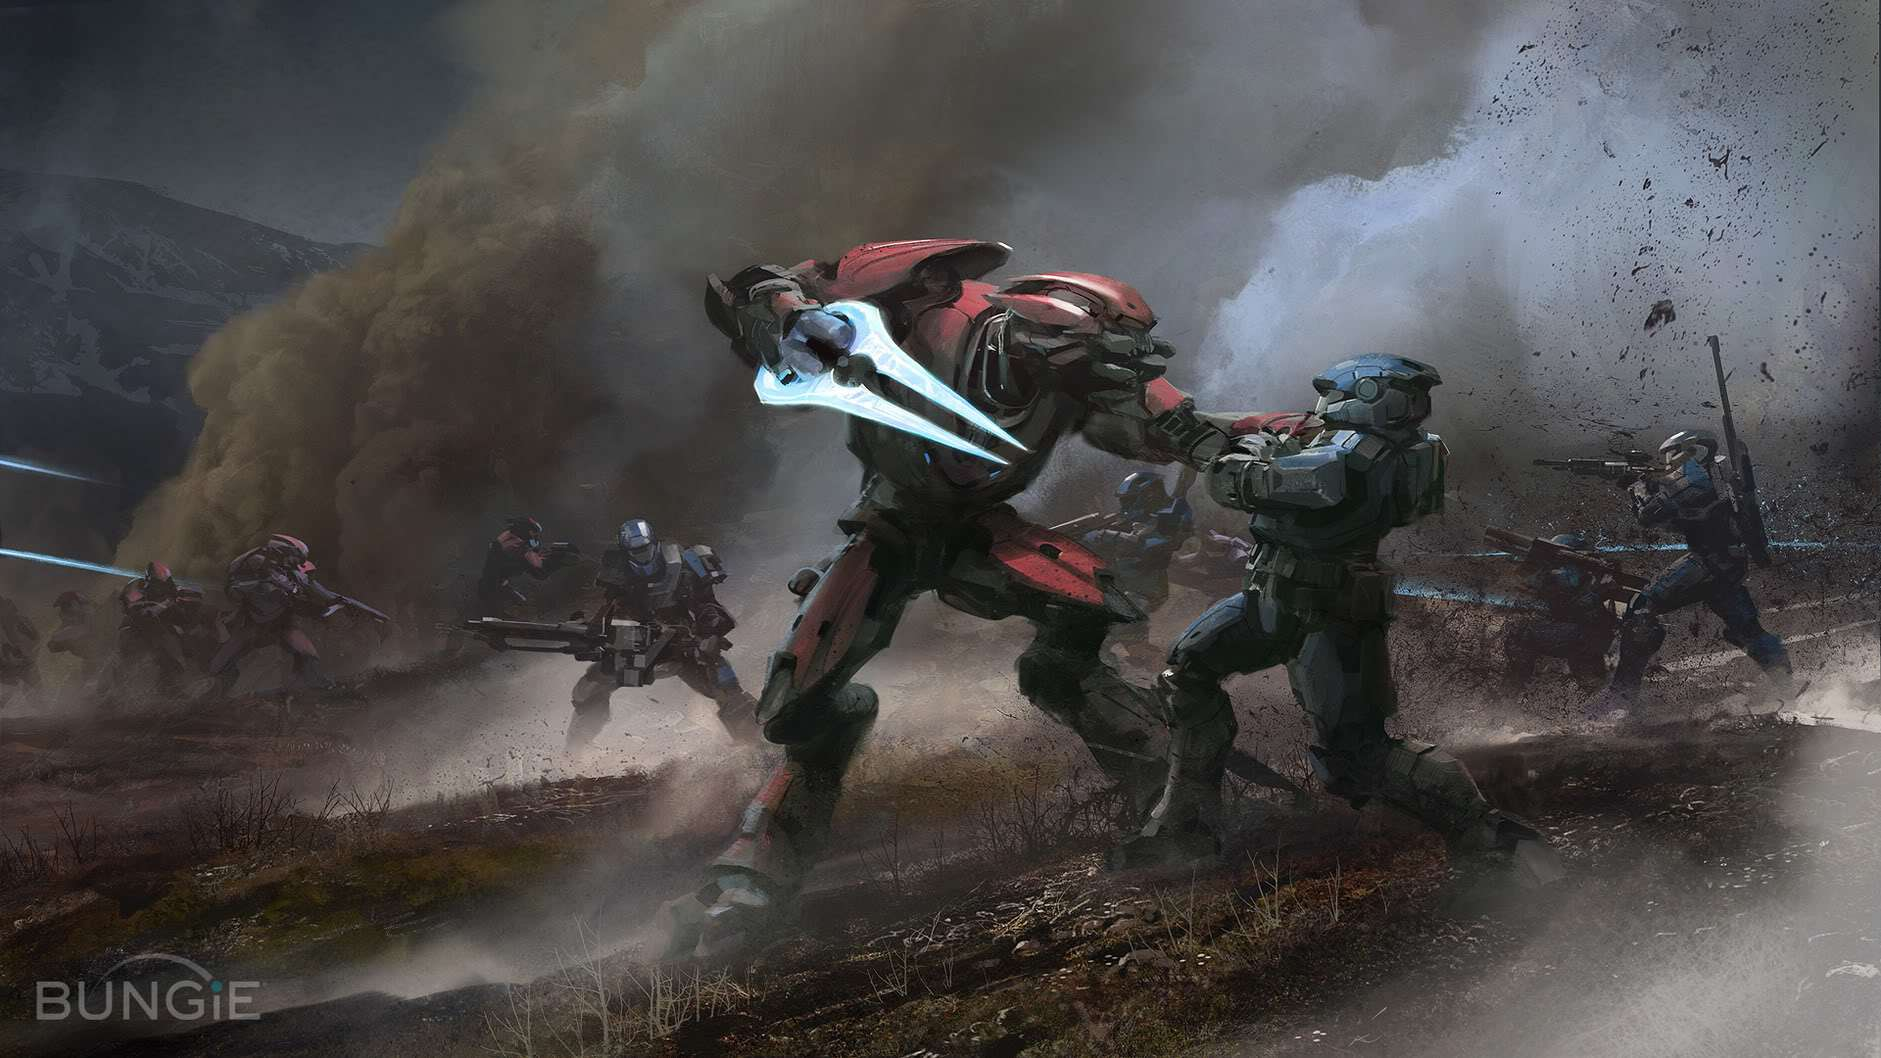 Halo: Reach infiltrates Gears 5 screenshot